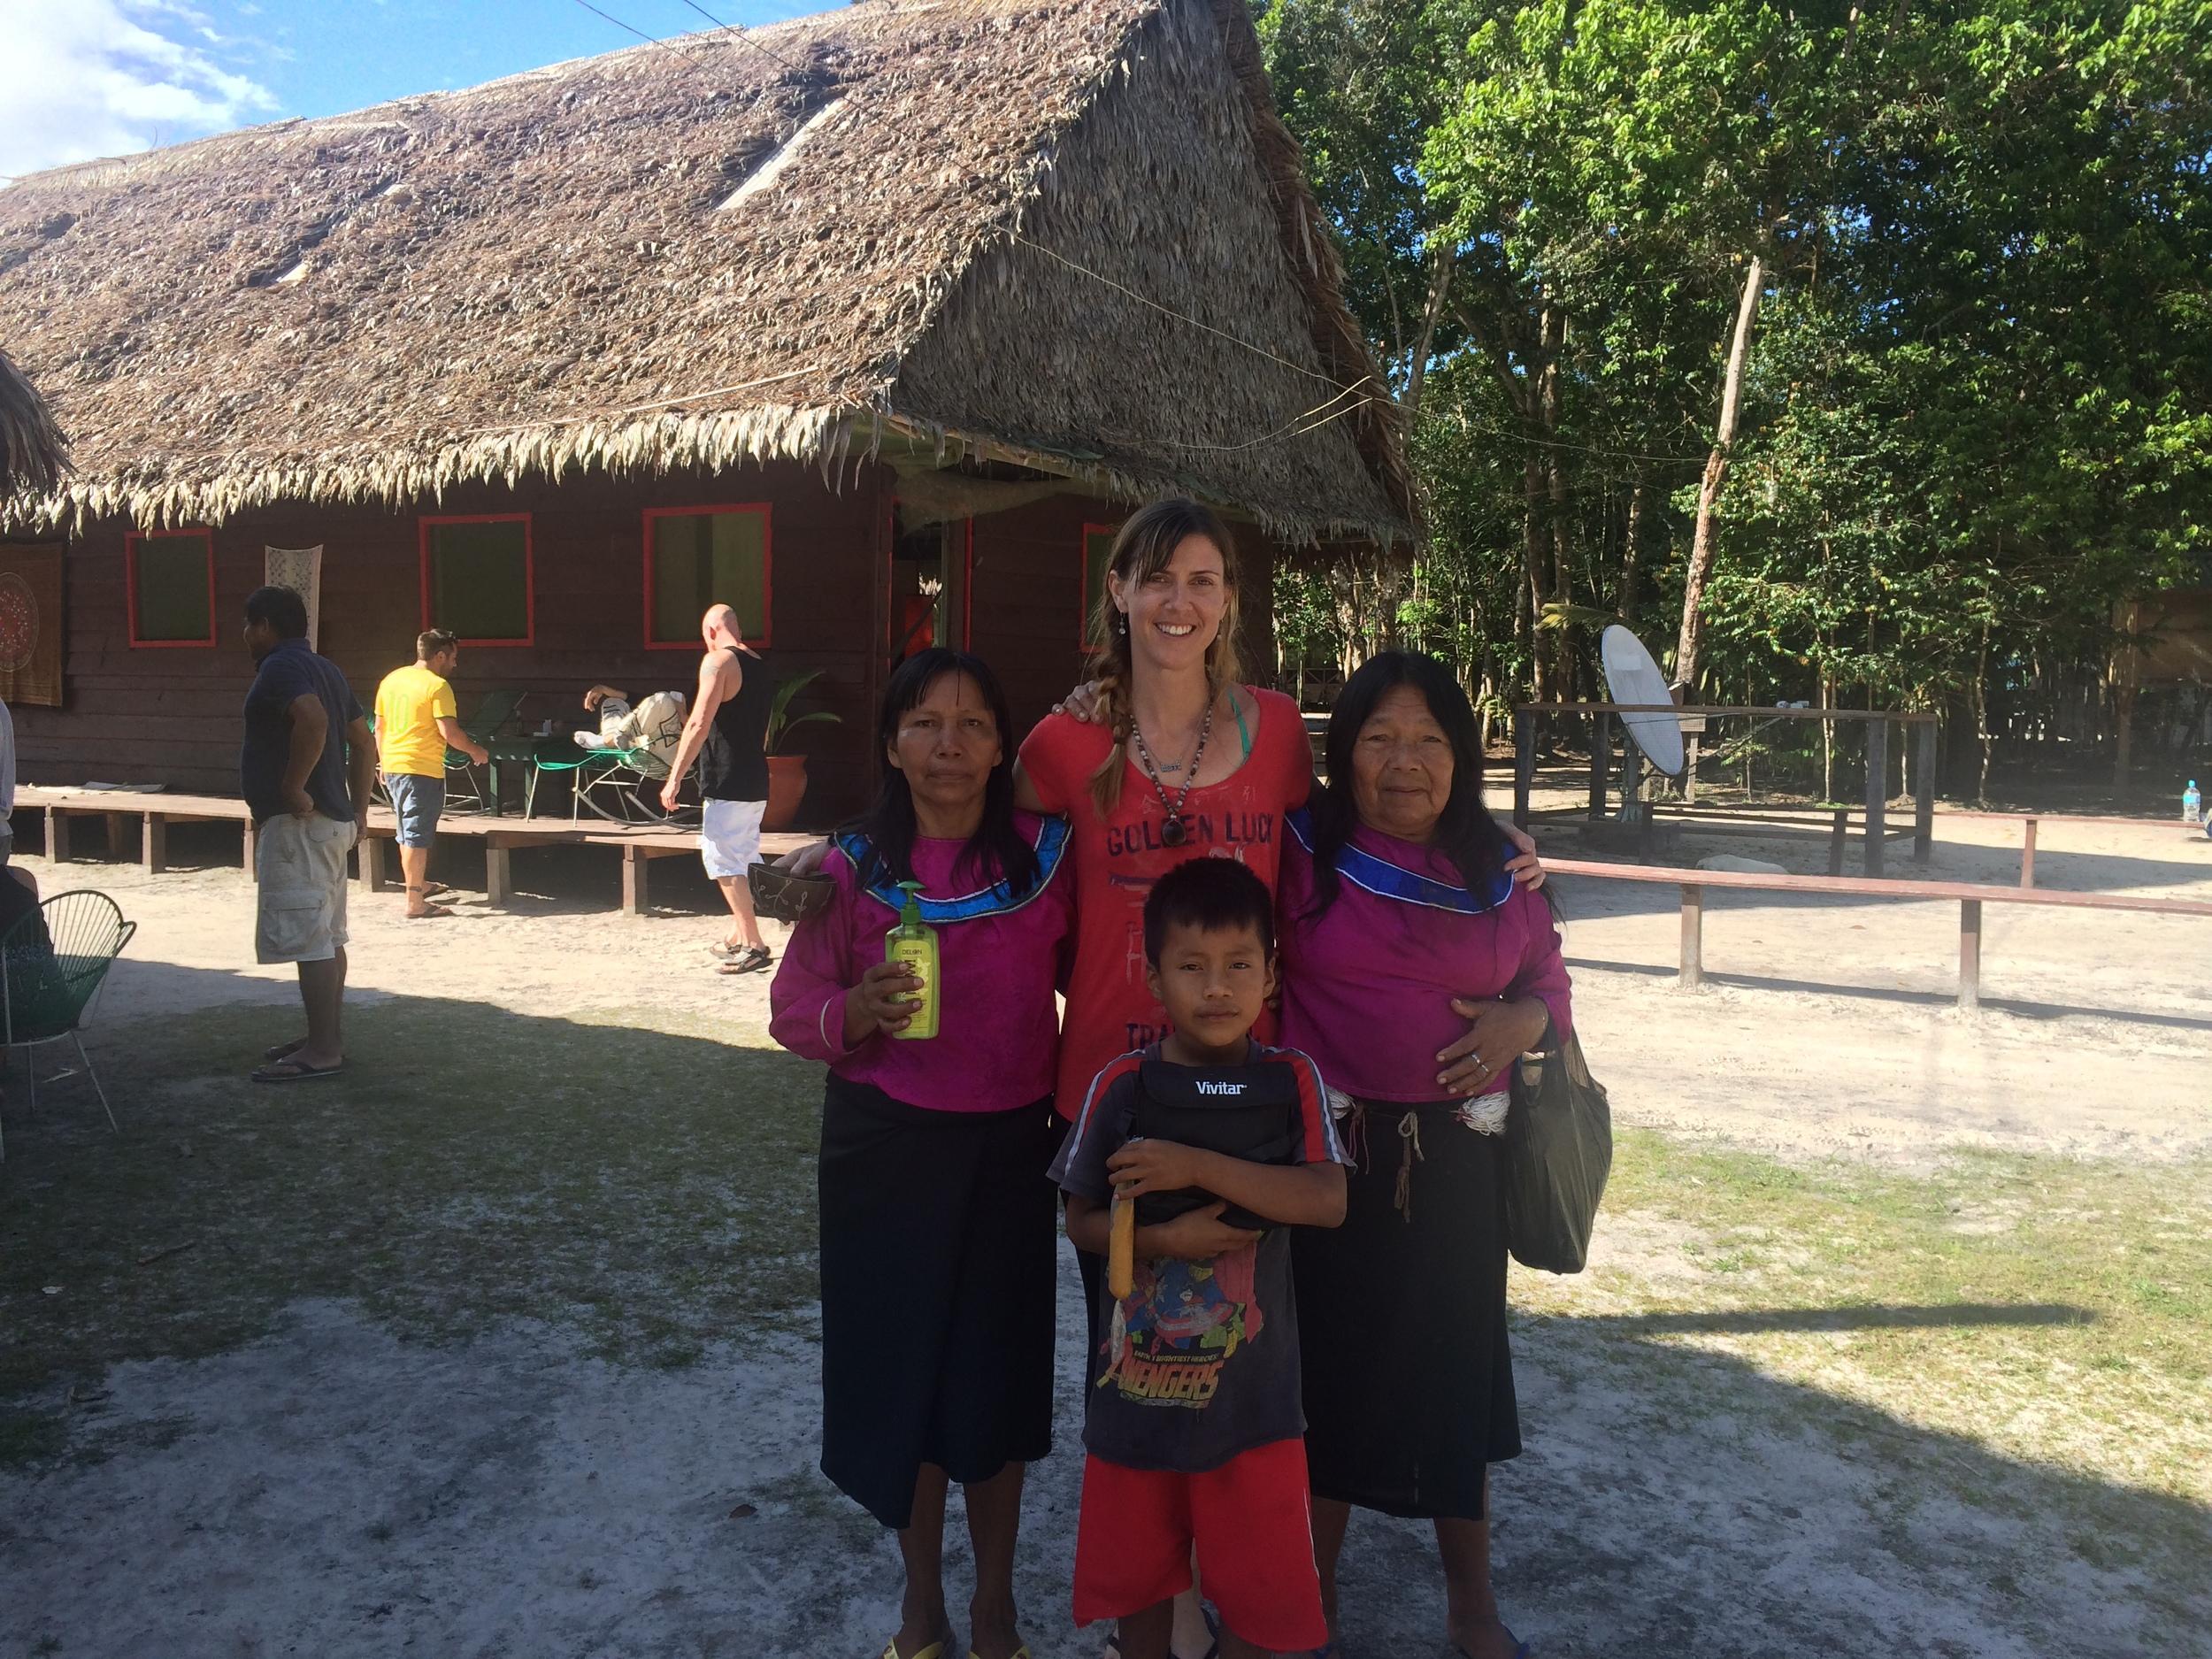 Me at the Nihue Rao Spiritual Center with 2 Shipibo medicine women and a future shaman-to-be.